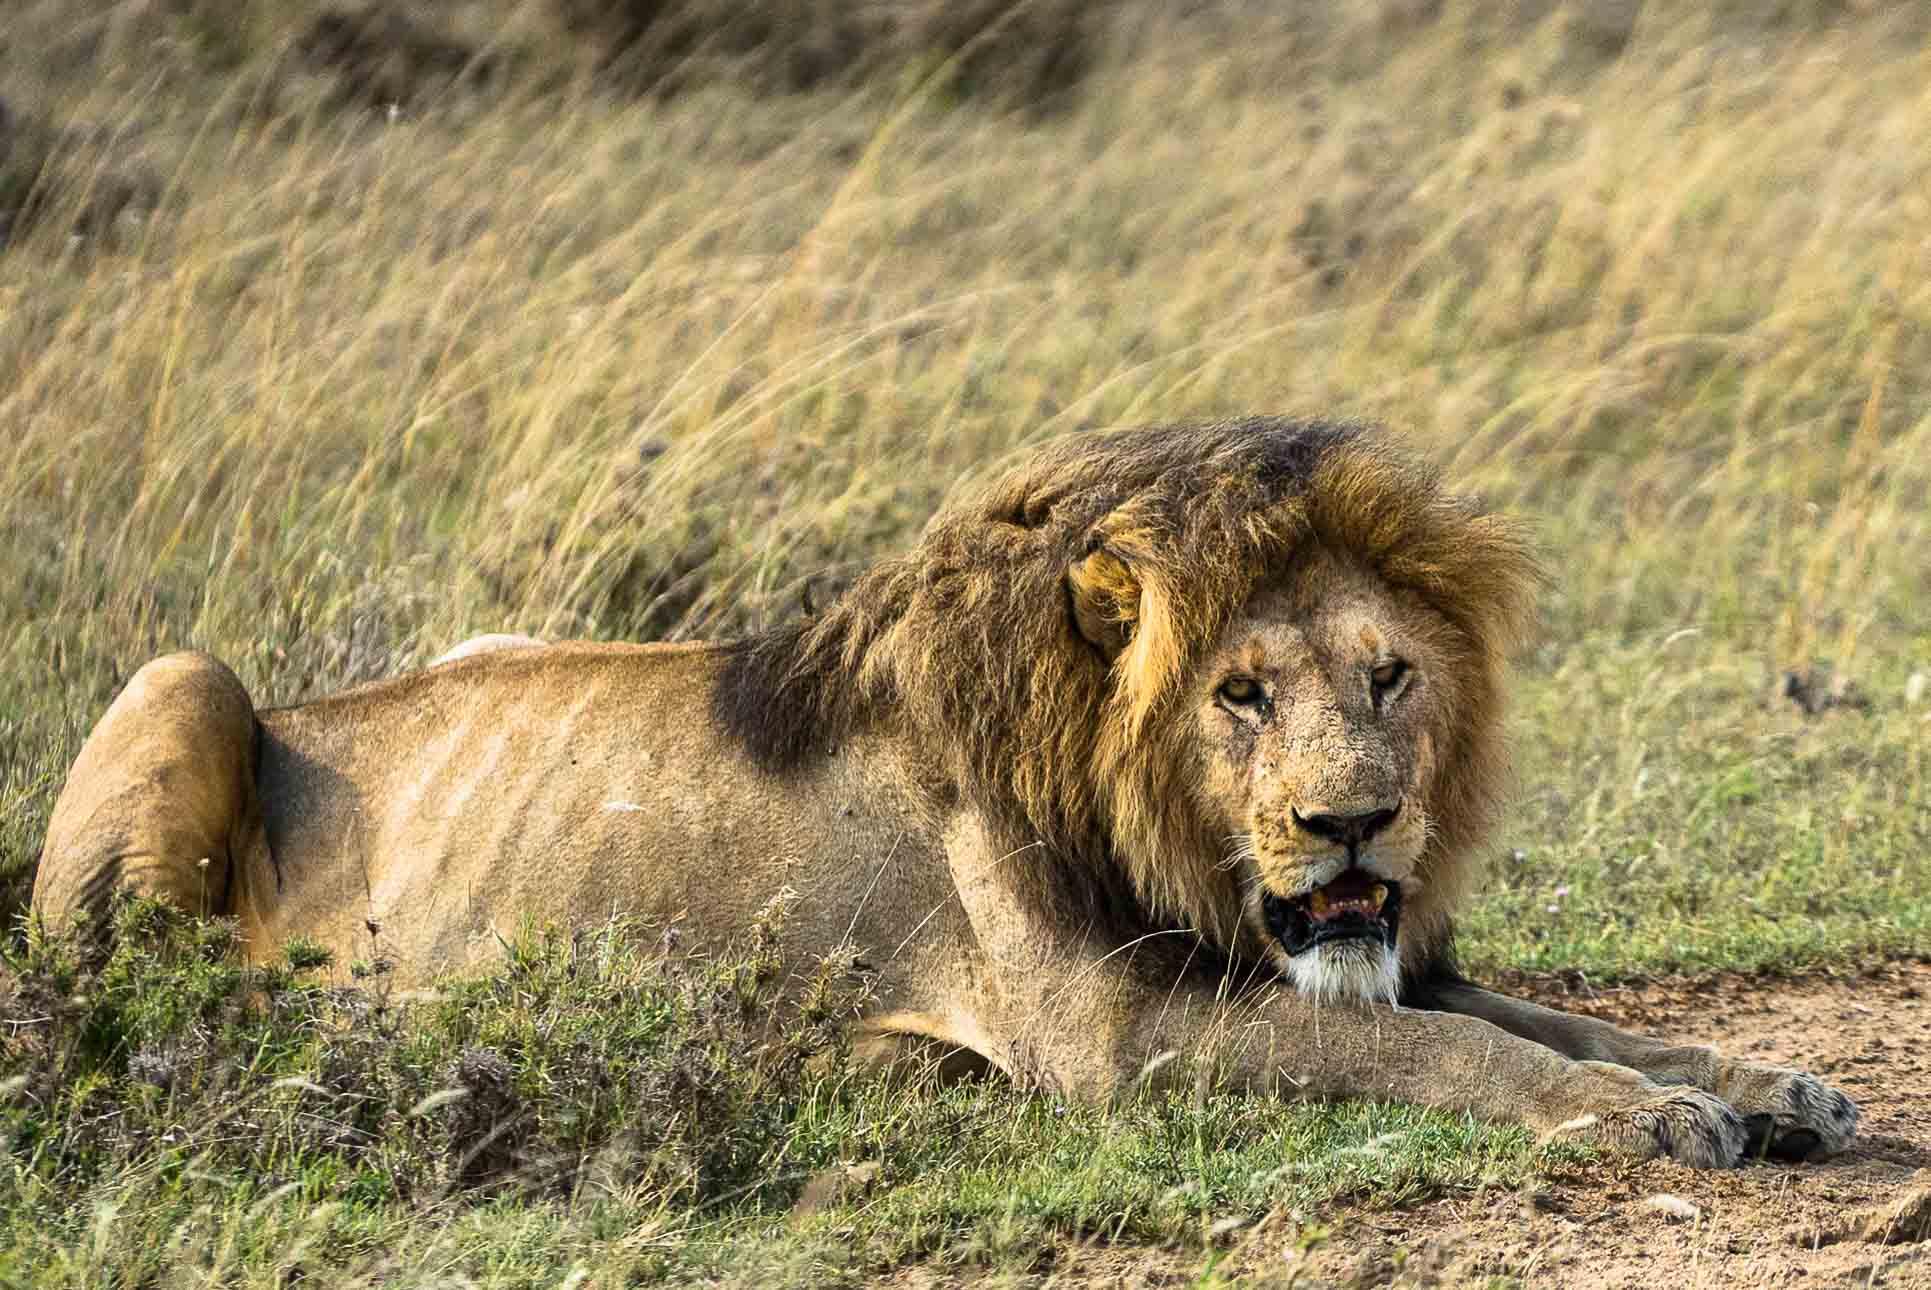 Serengeti Safari Old Lion